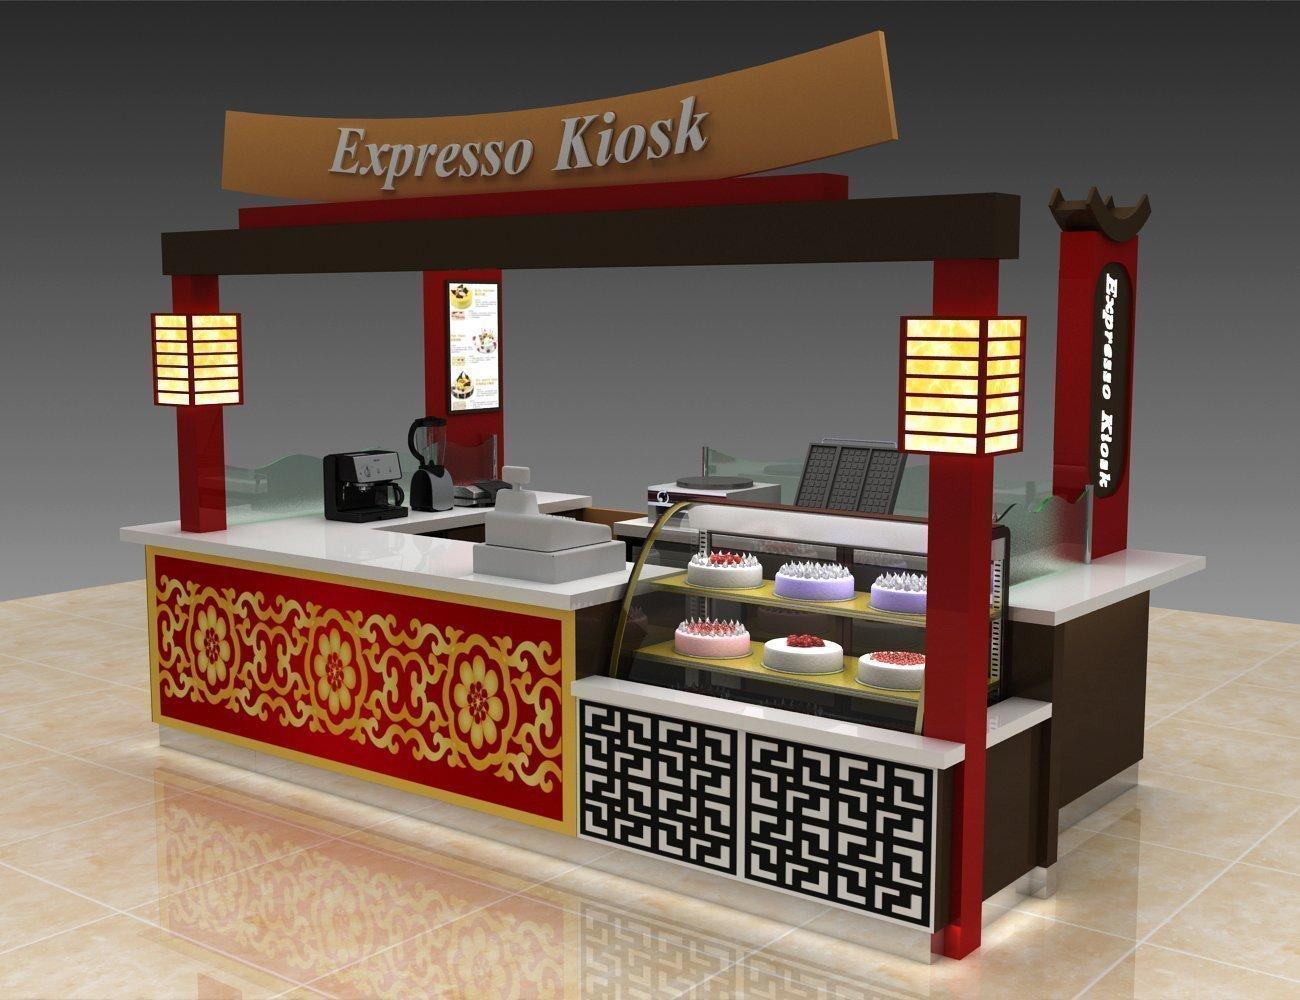 Mall food kiosk design for sale | Japanese traditional food